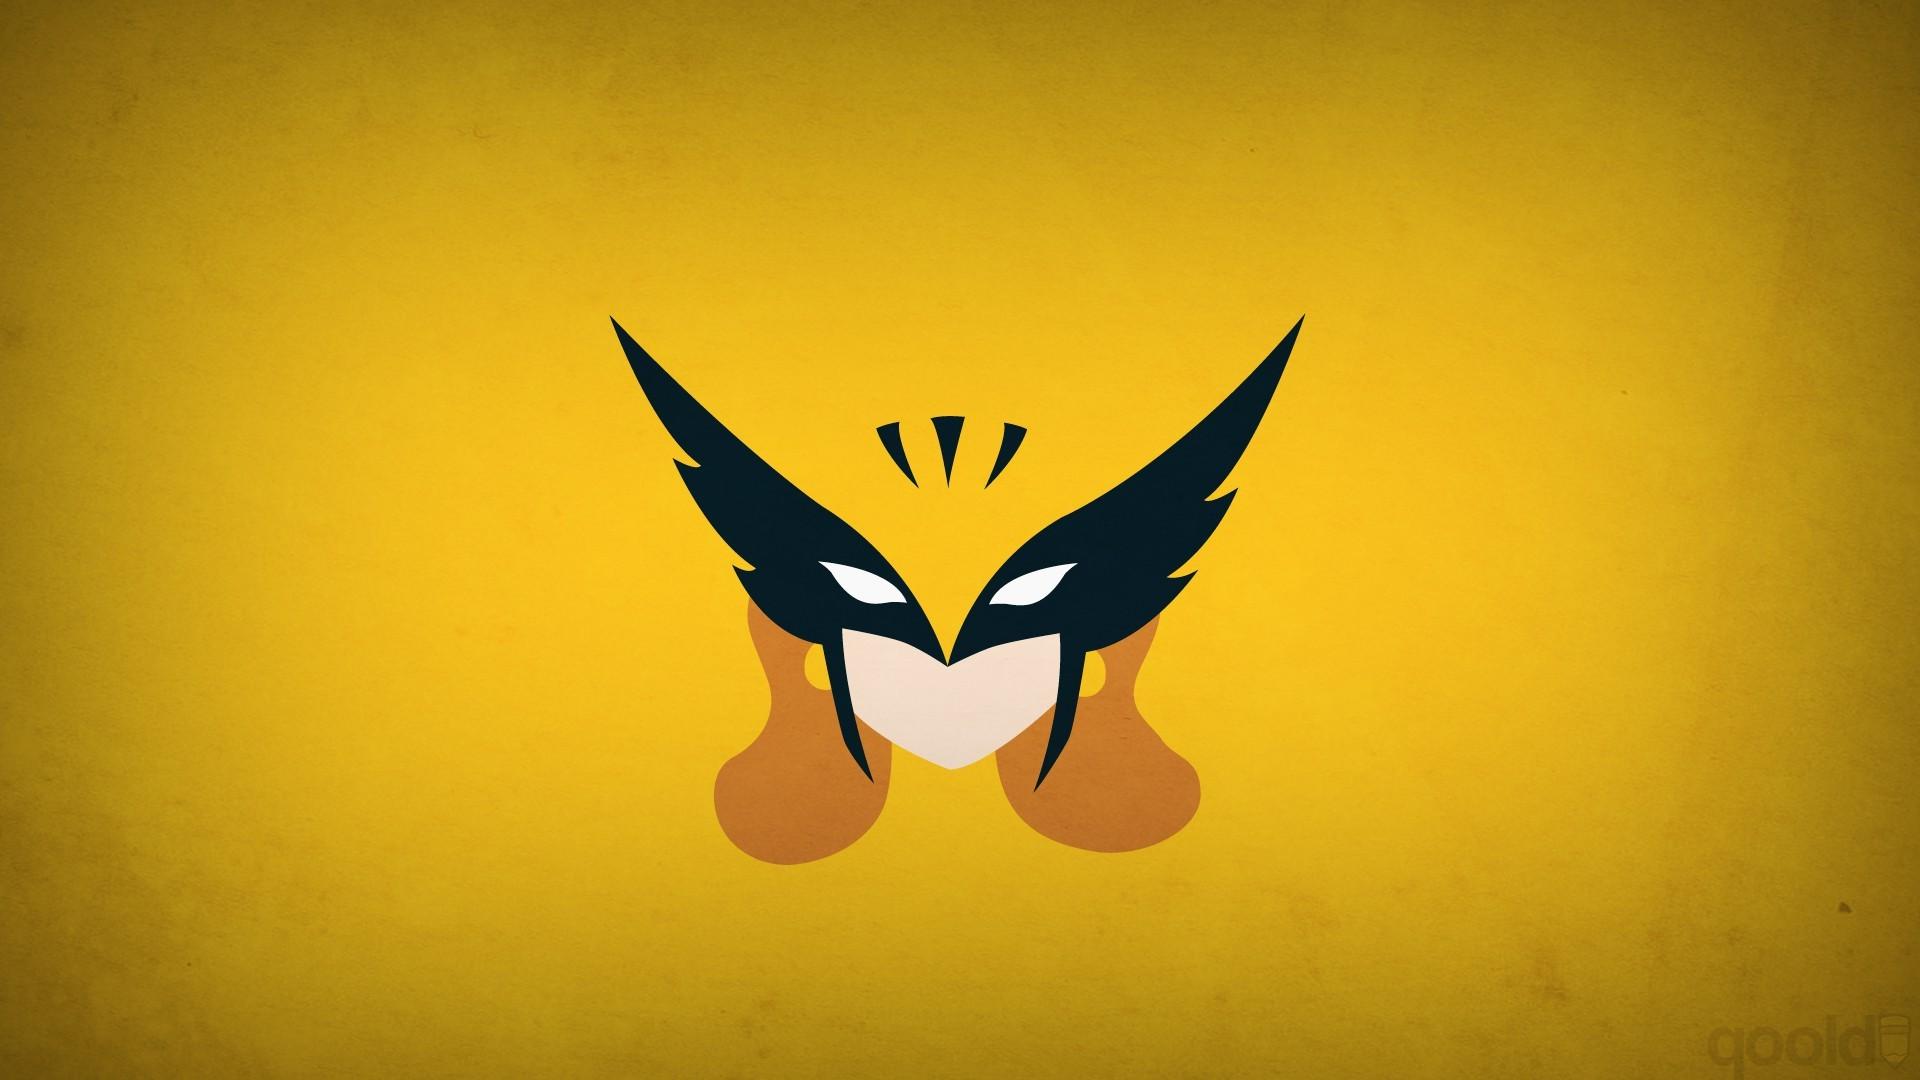 3d Cartoon Girl Wallpapers Hawkgirl Blo0p Superhero Minimalism Dc Comics X Men